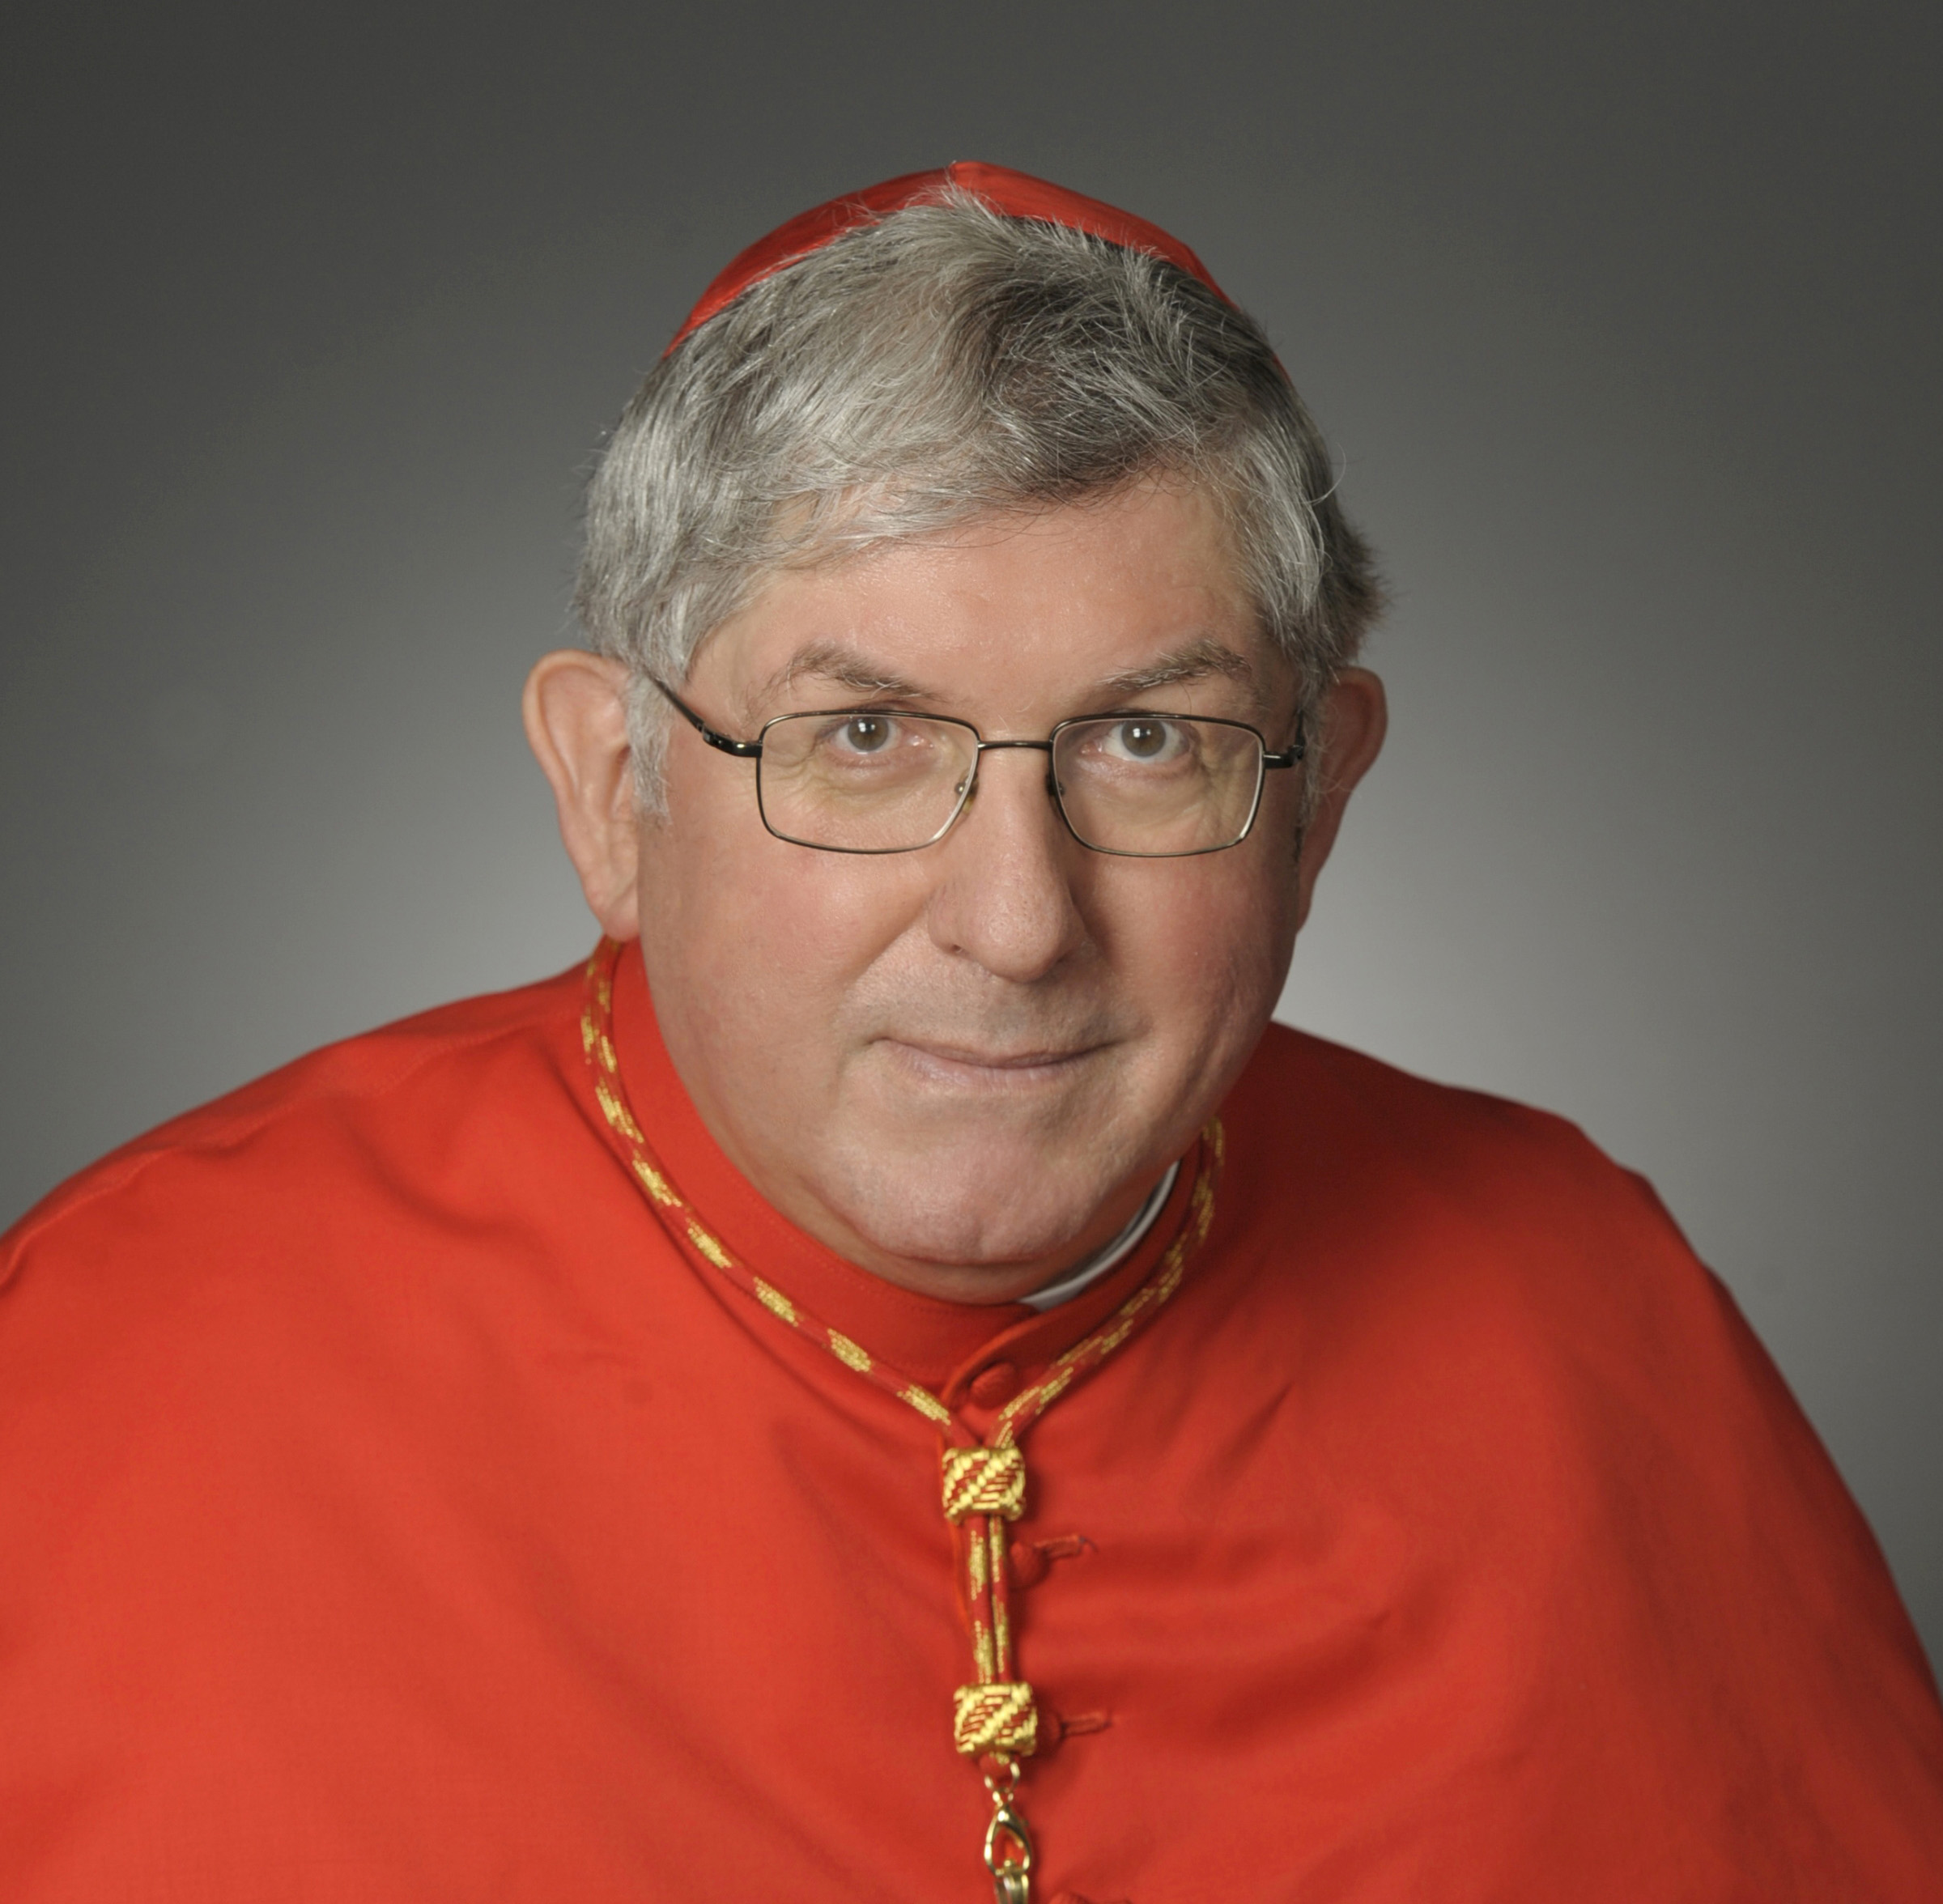 His Eminence Thomas Cardinal Collins